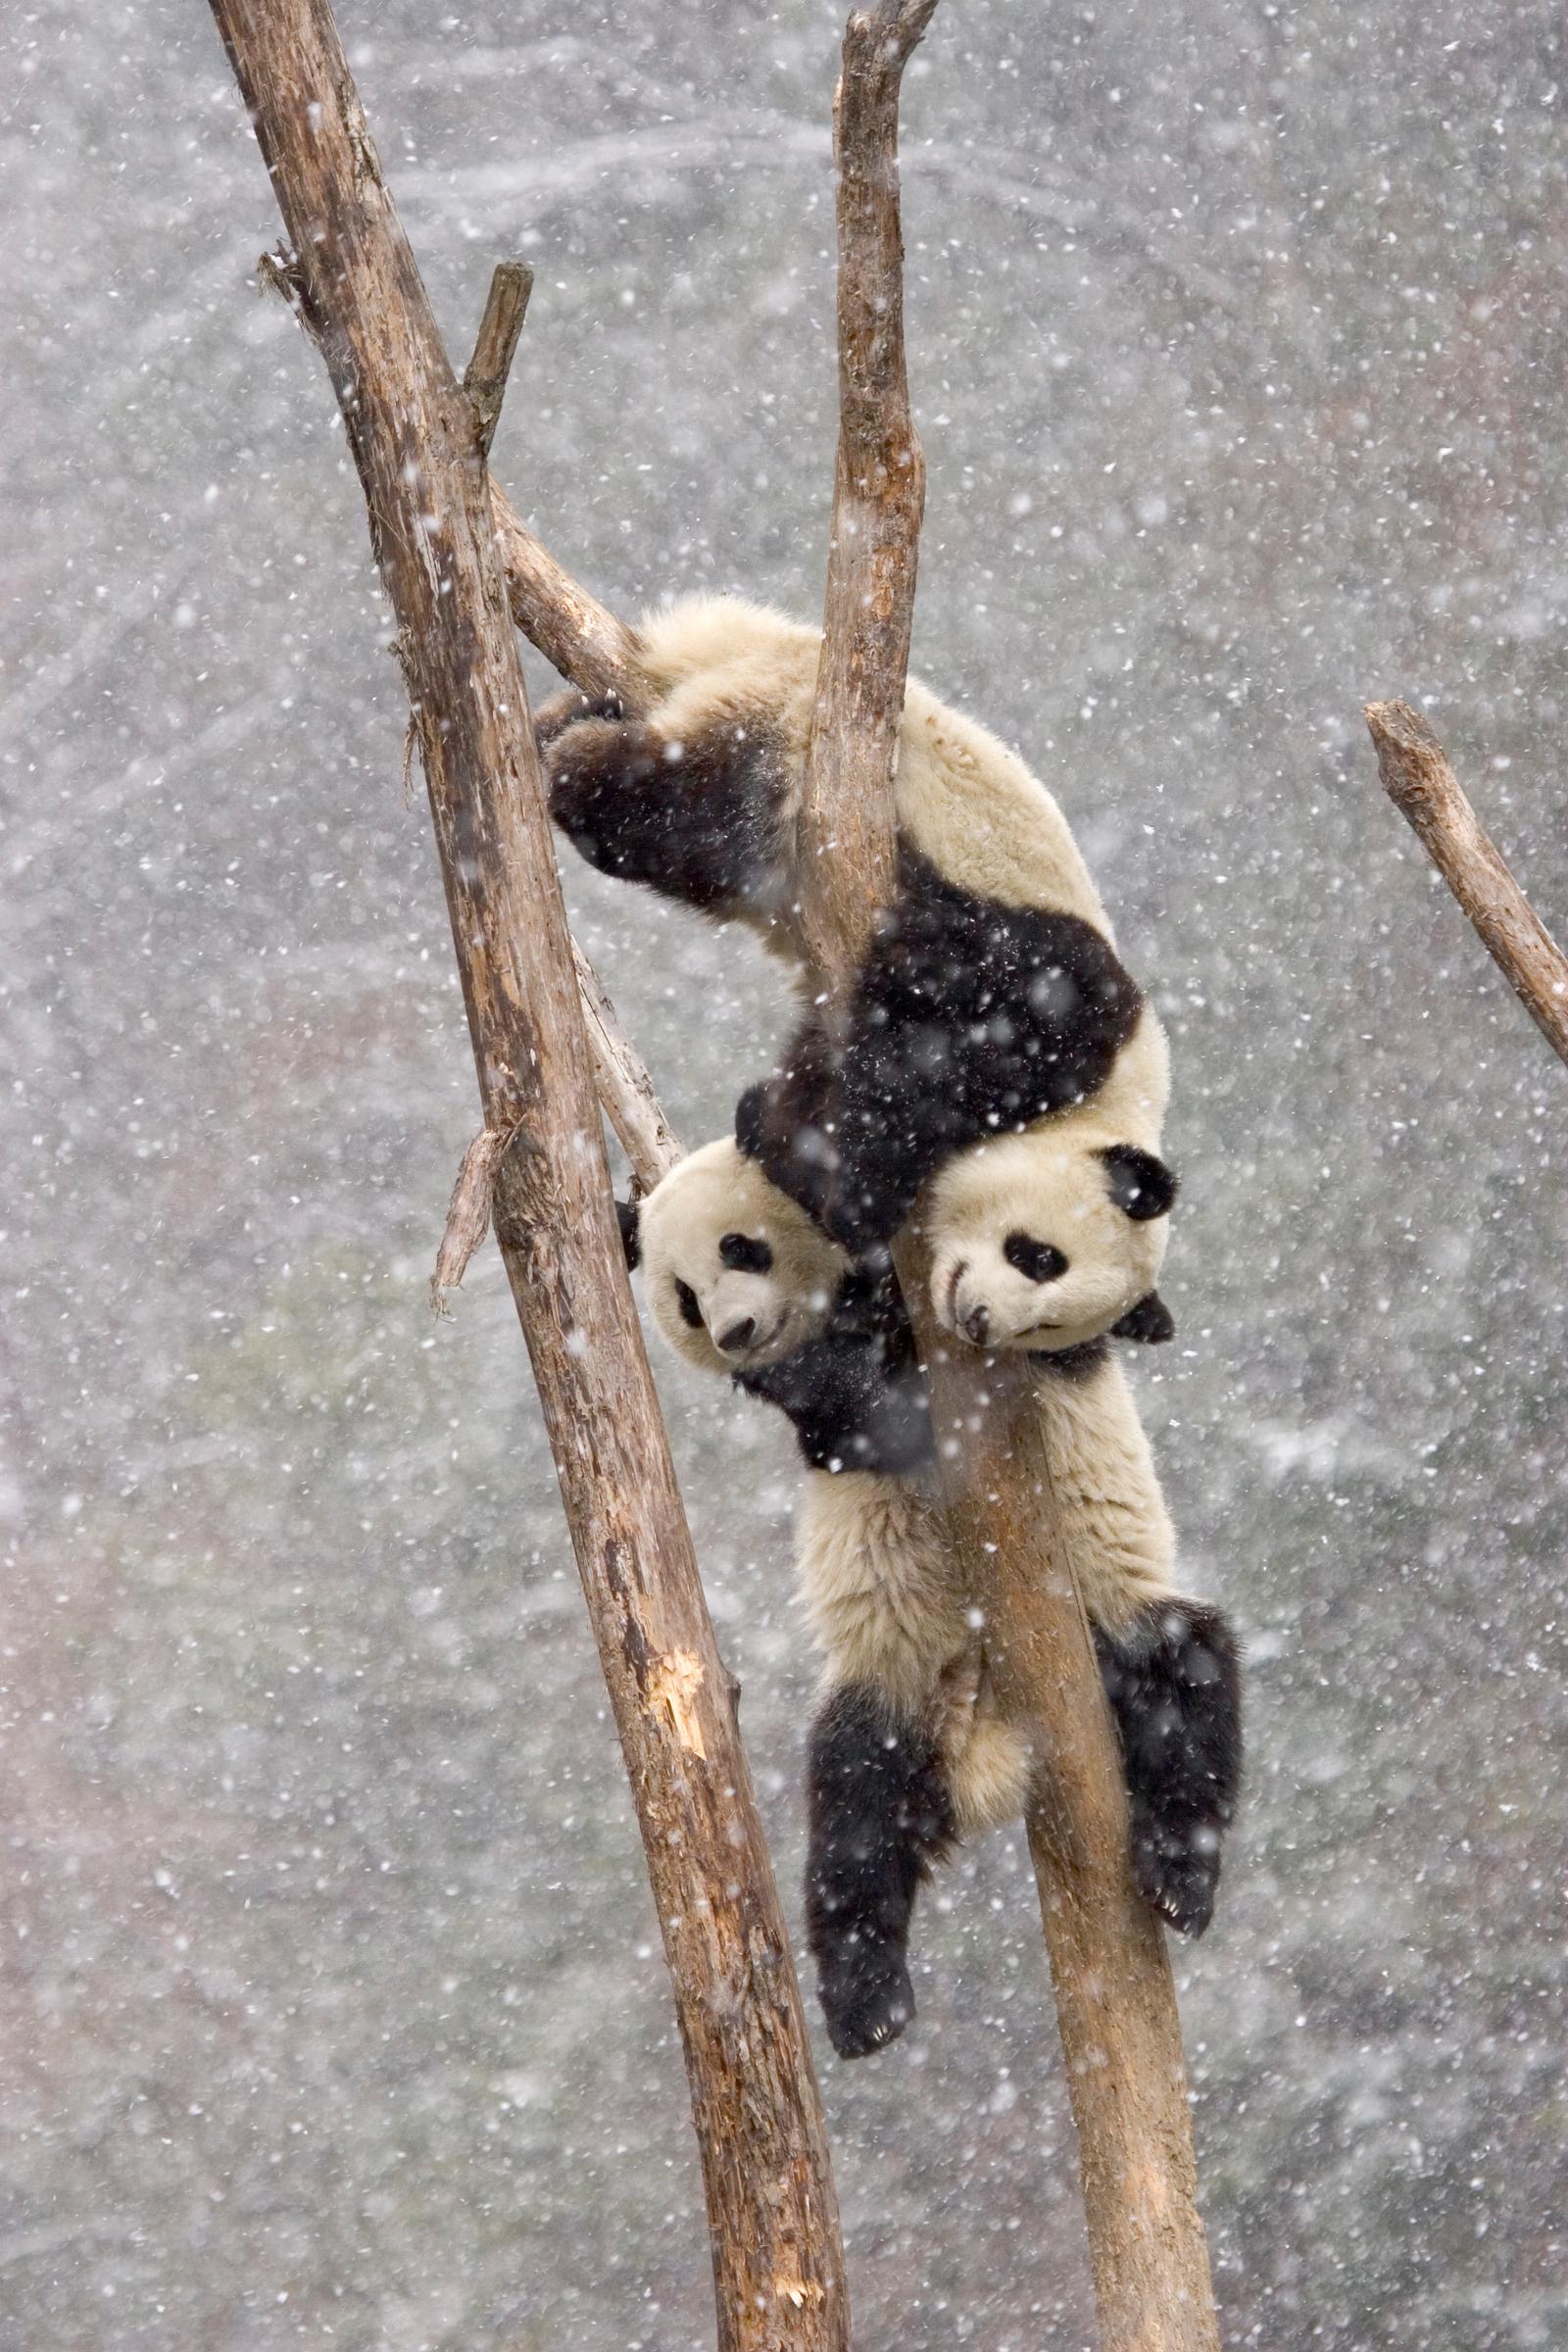 Grosse Pandas im Schnee, Sichuan, China